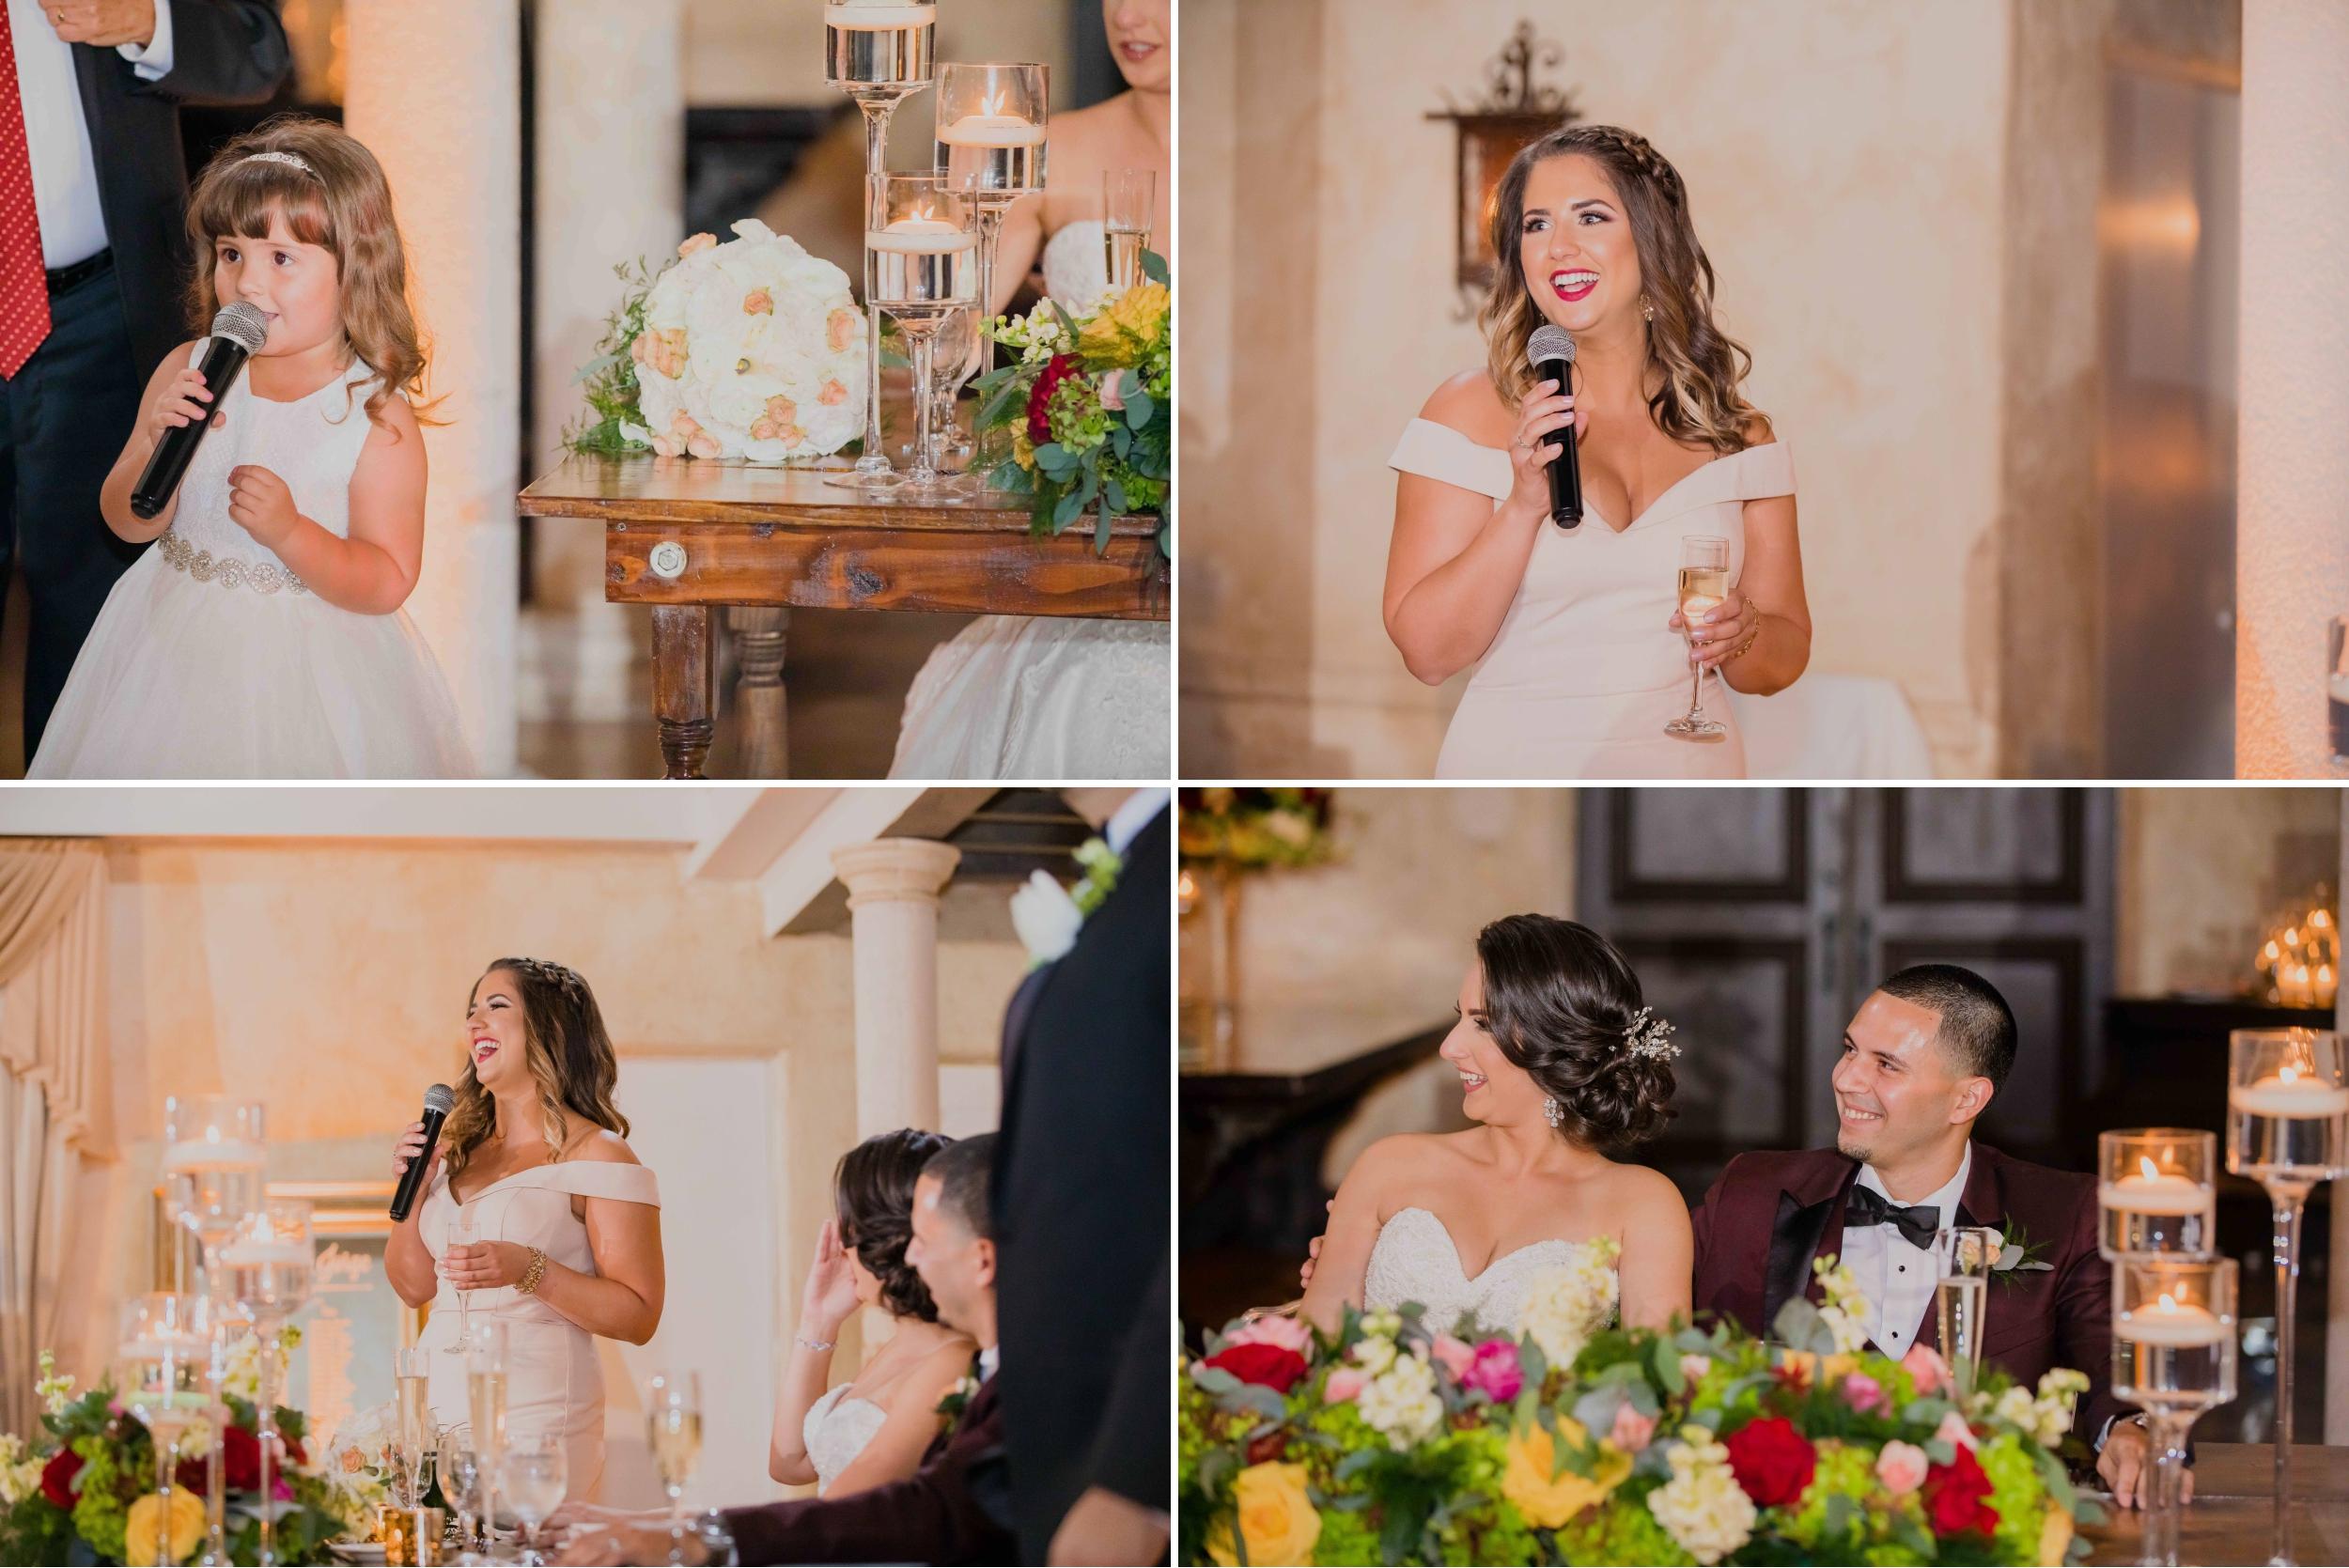 Wedding - Coco Plum - Coral Gables Congregational - Santy Martinez Photography 37.jpg